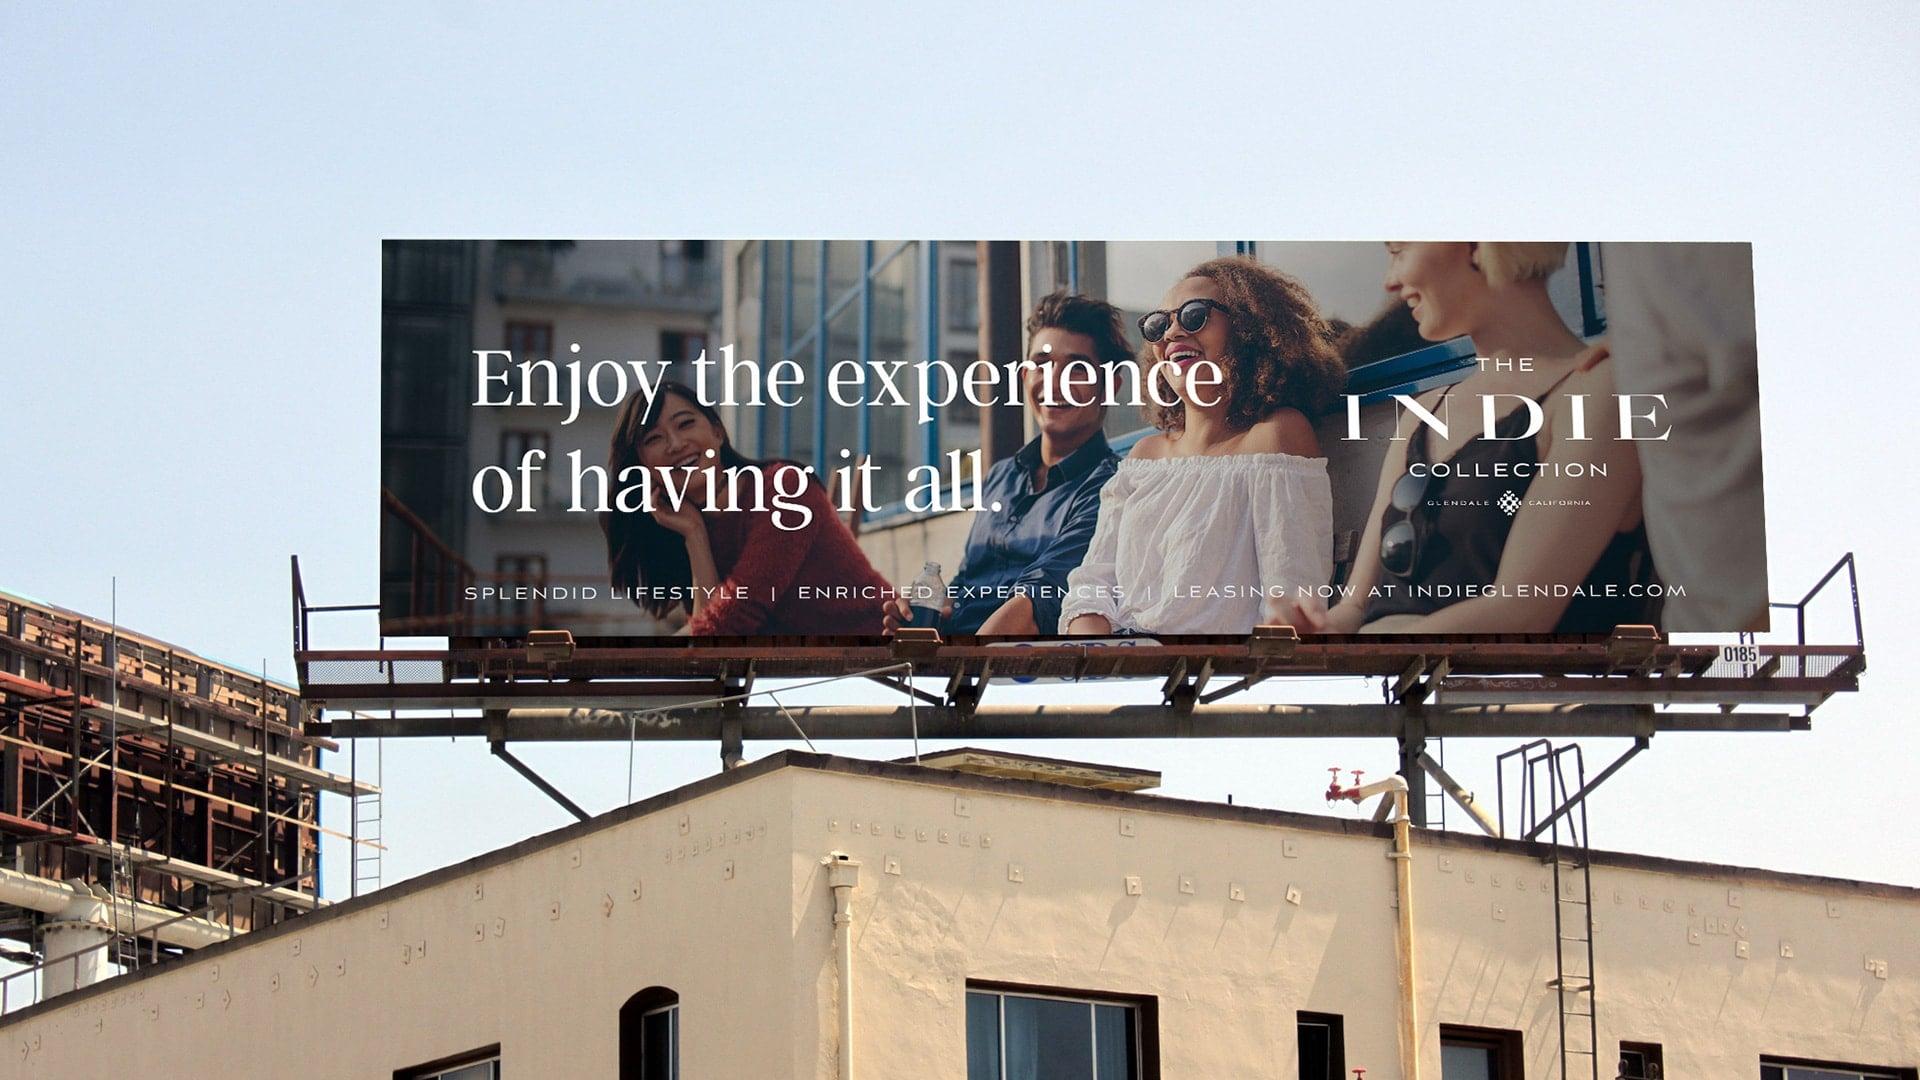 The Indie Collection Billboard - Unsung Studio Branding